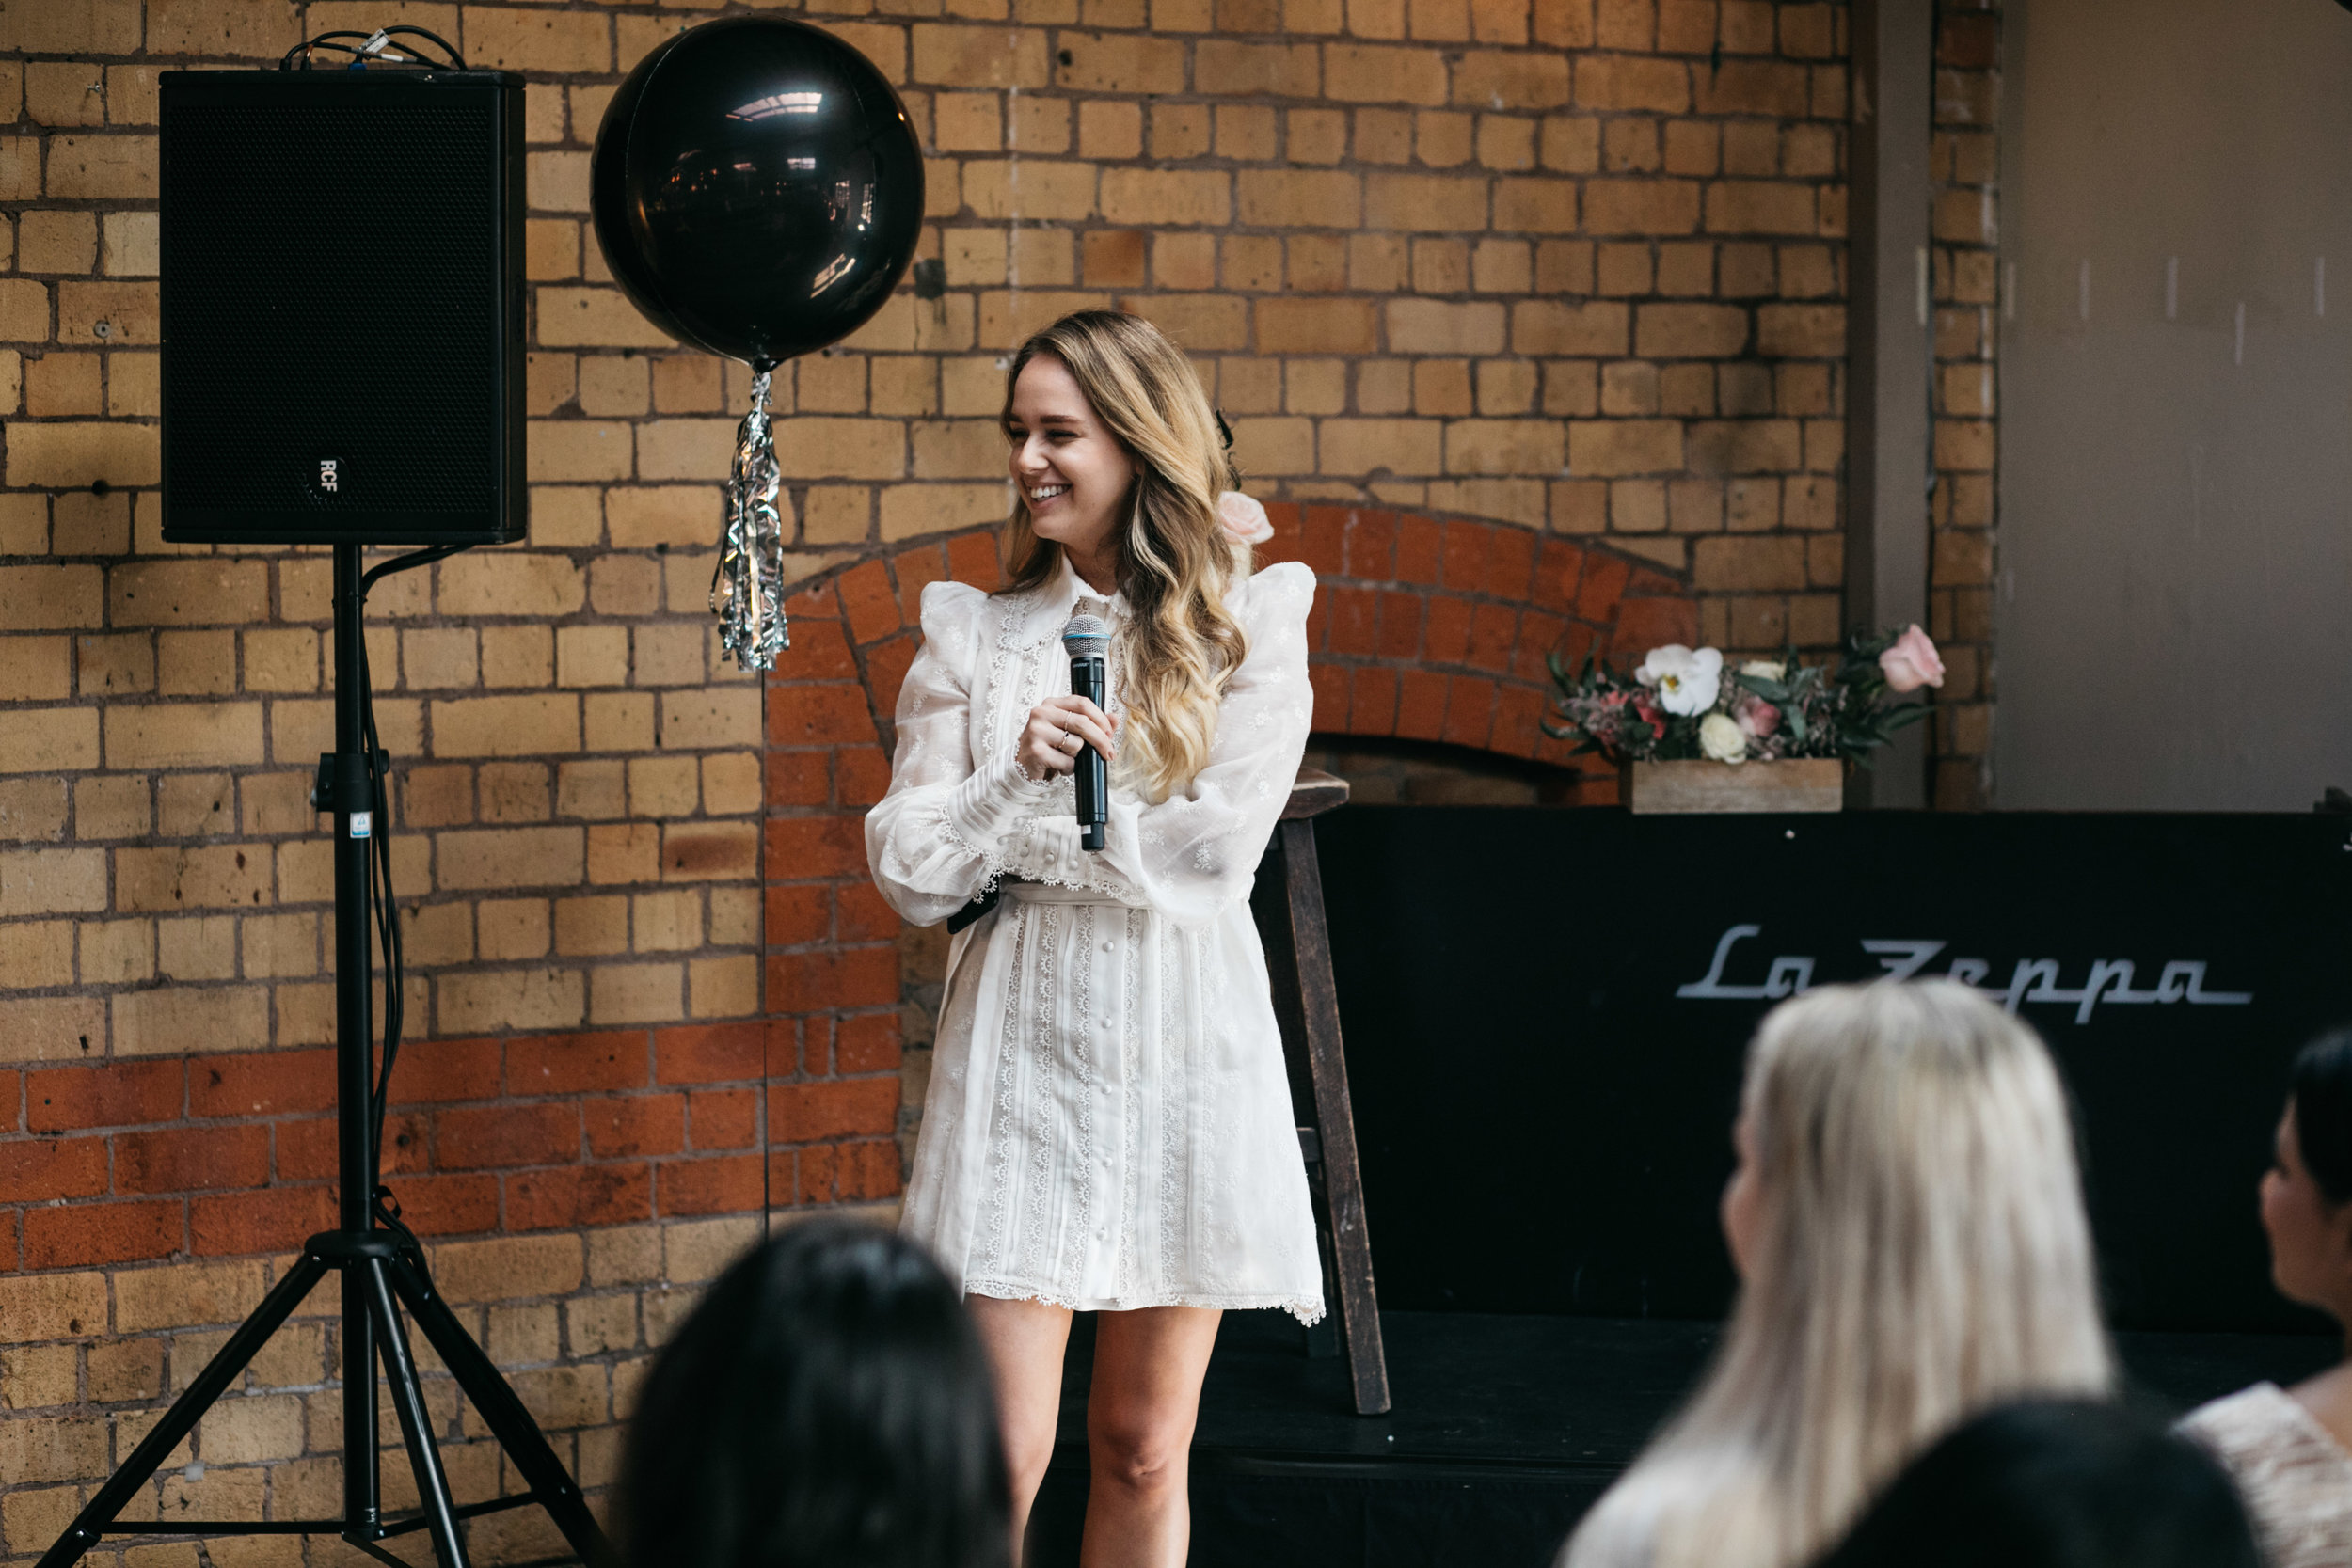 designer wardrobe - Donielle Brooke - La Zeppa